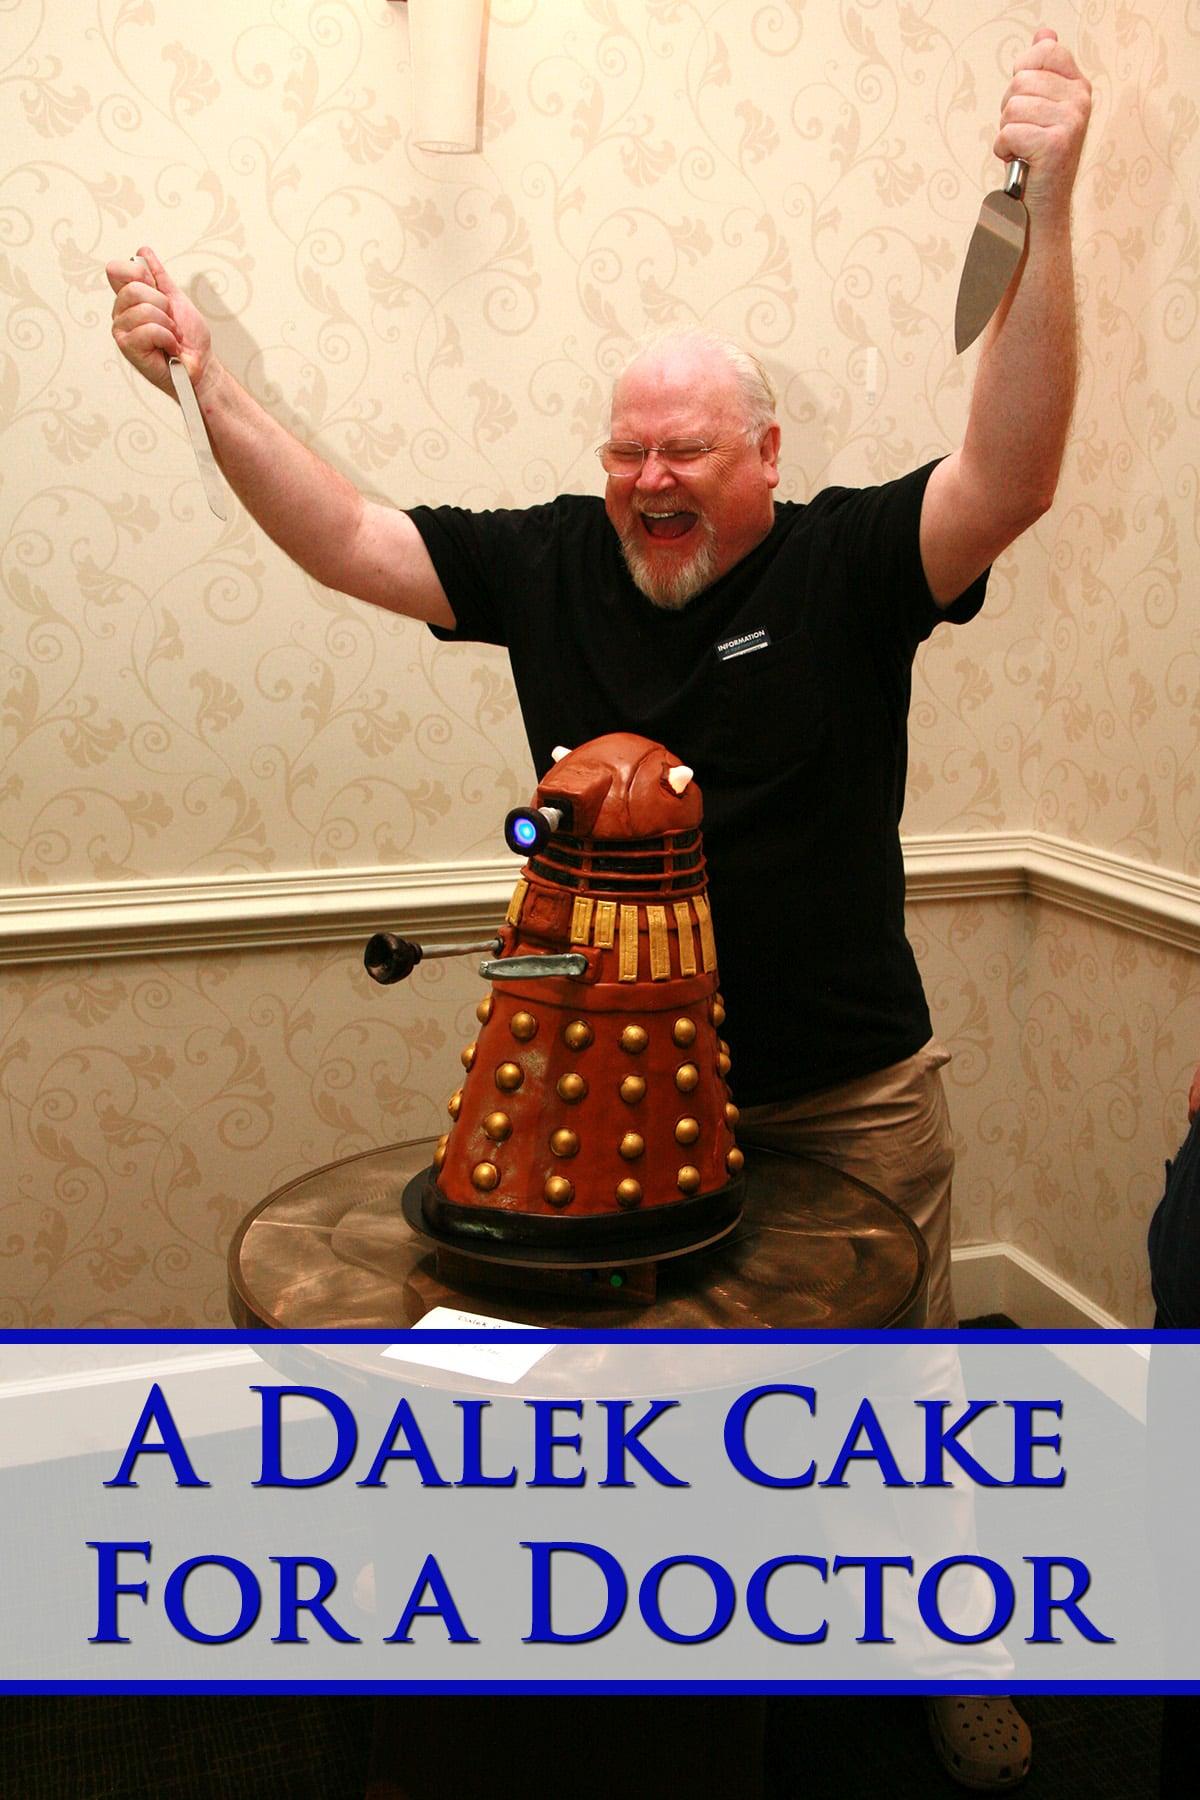 Colin Baker posing behind the Dalek cake, knives raised.